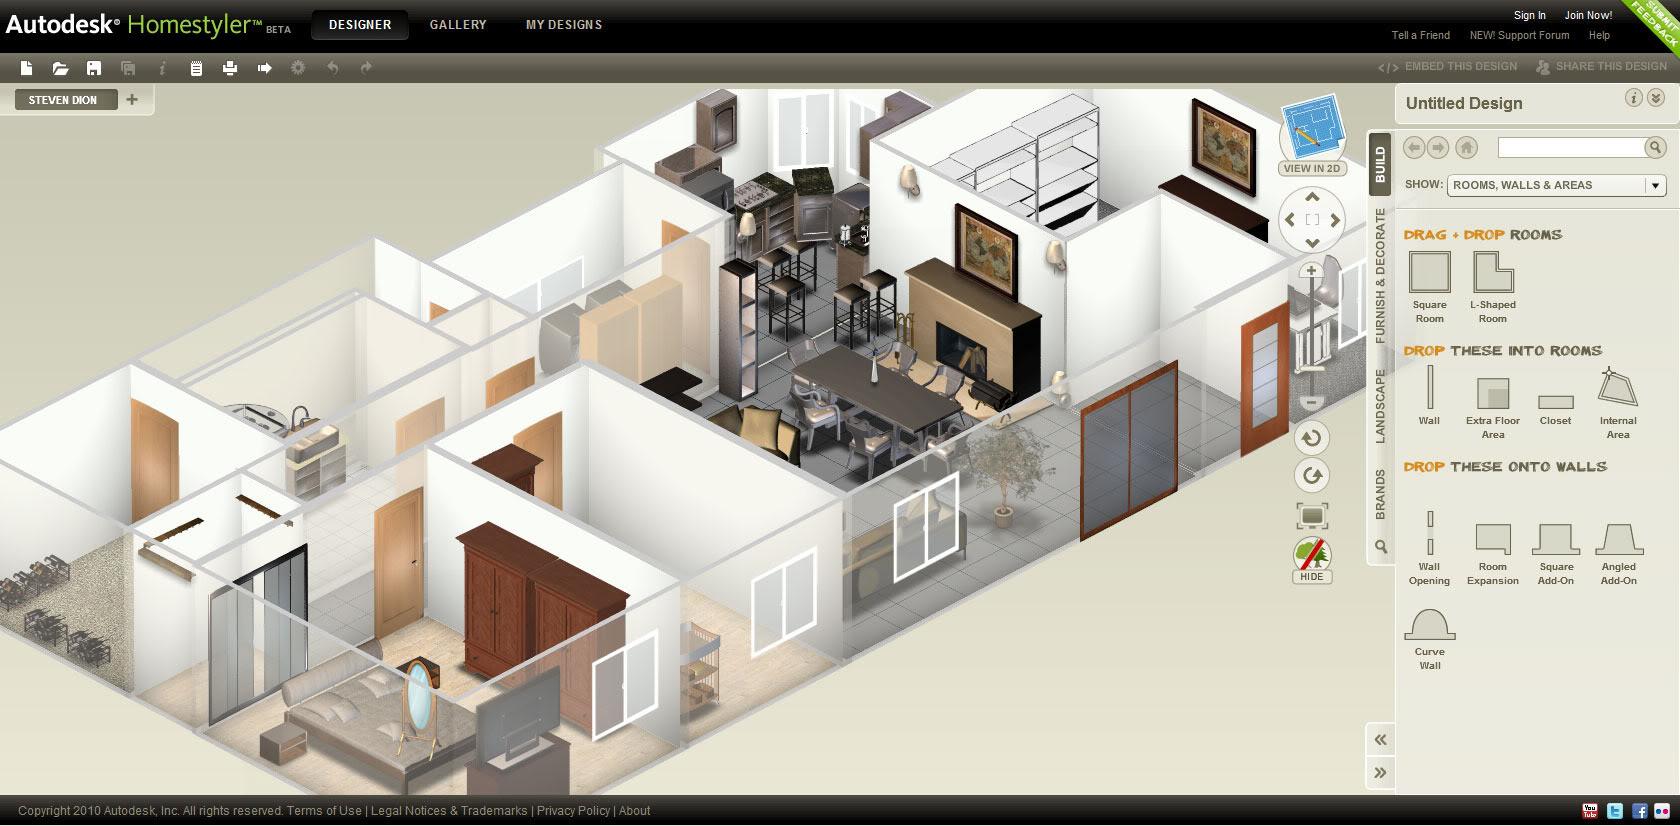 Design tech summit deb barrett - Homestyler interior design ...